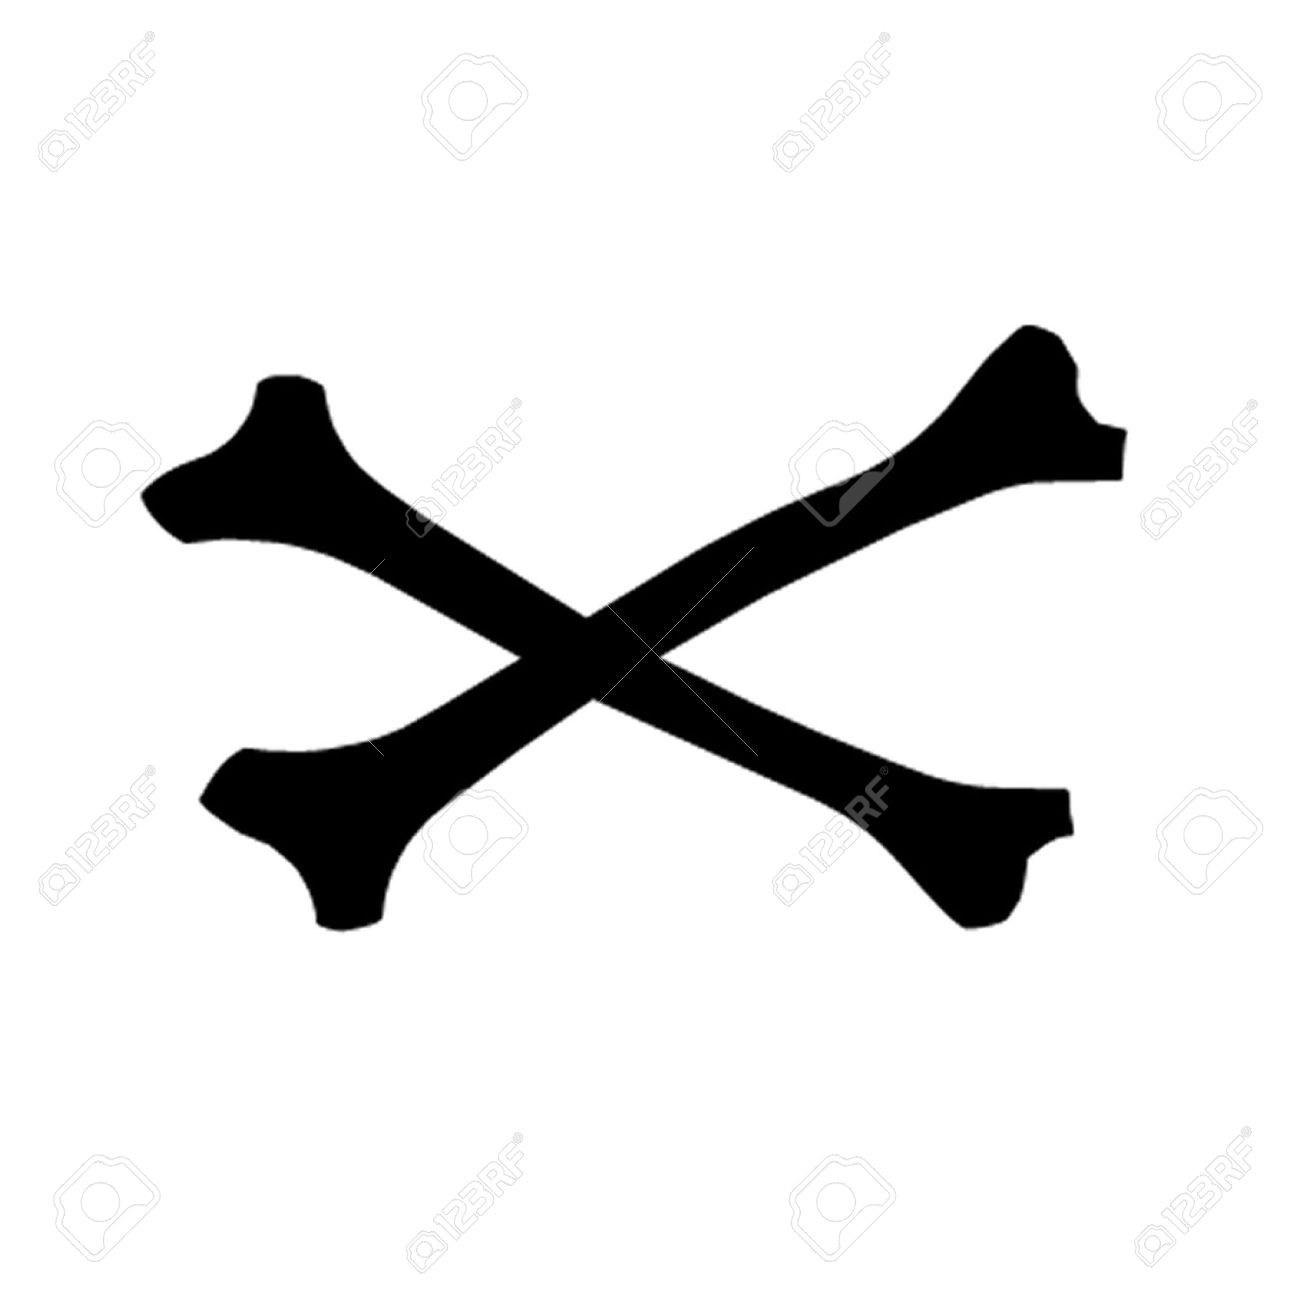 1300x1300 Crossbones Silhouette Elegant Cross Bones Royalty Free Cliparts